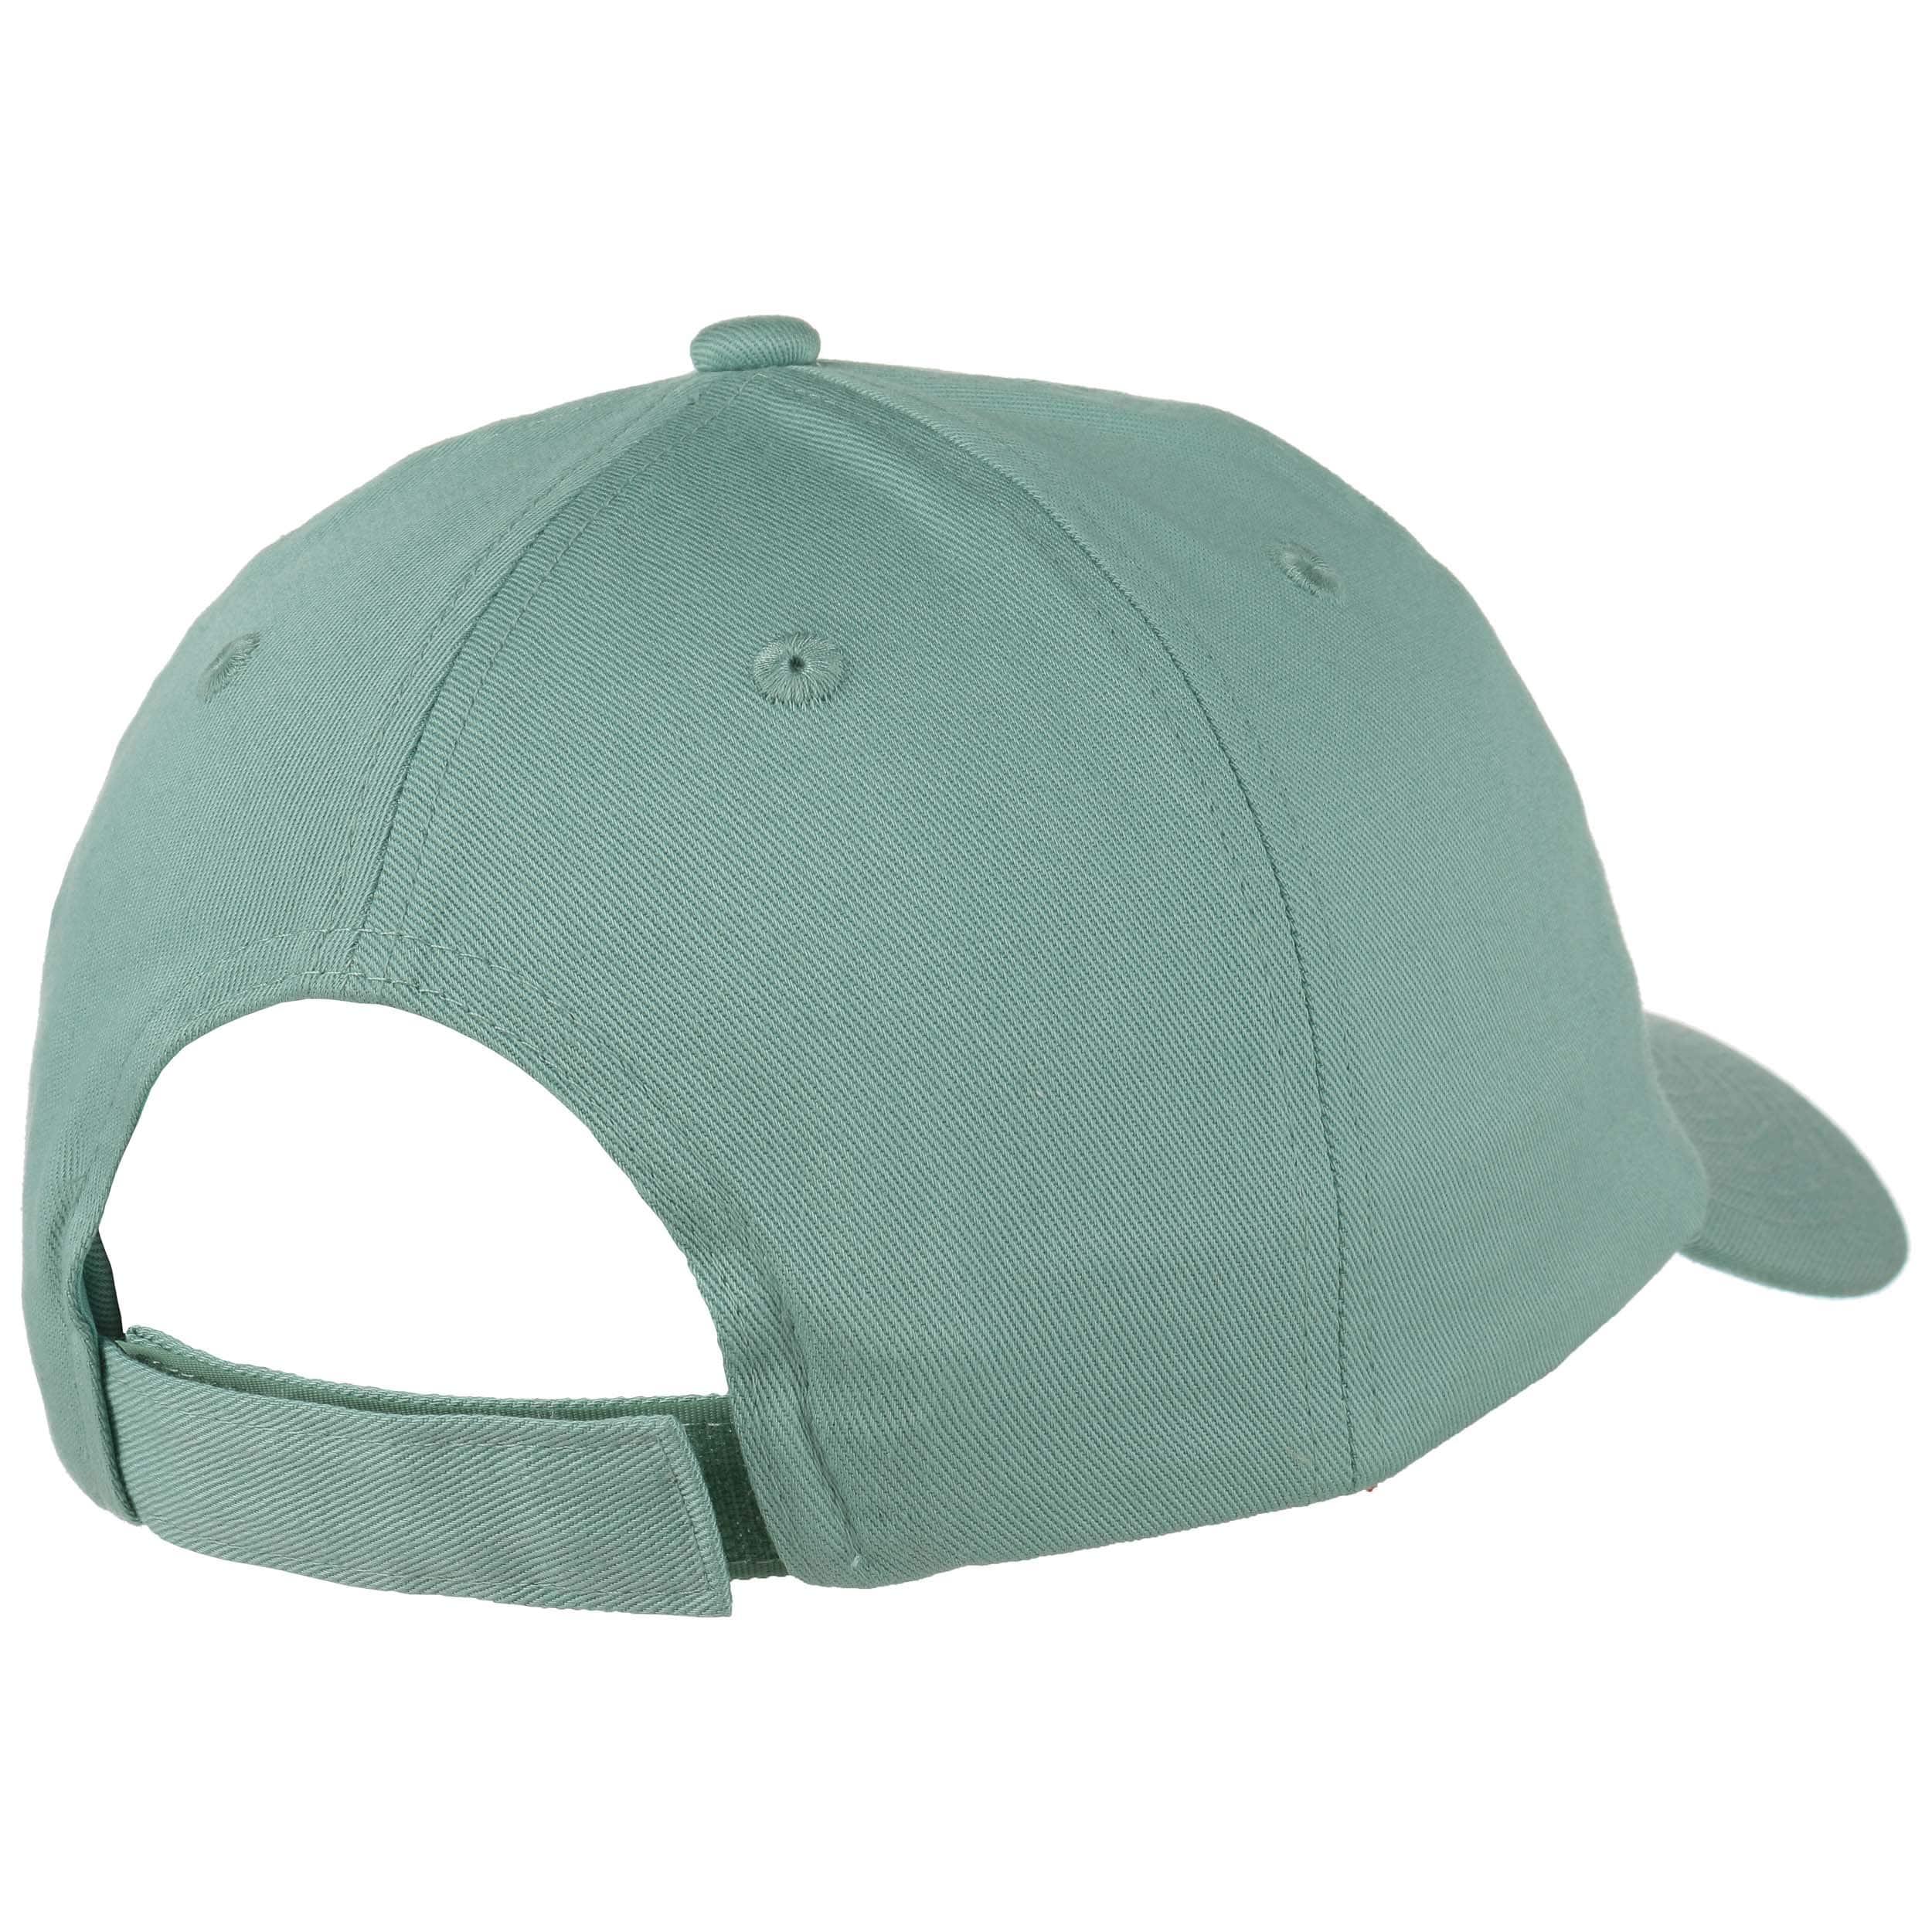 1 Baseball Cap by PUMA - mint green 3 ... e9186e72262